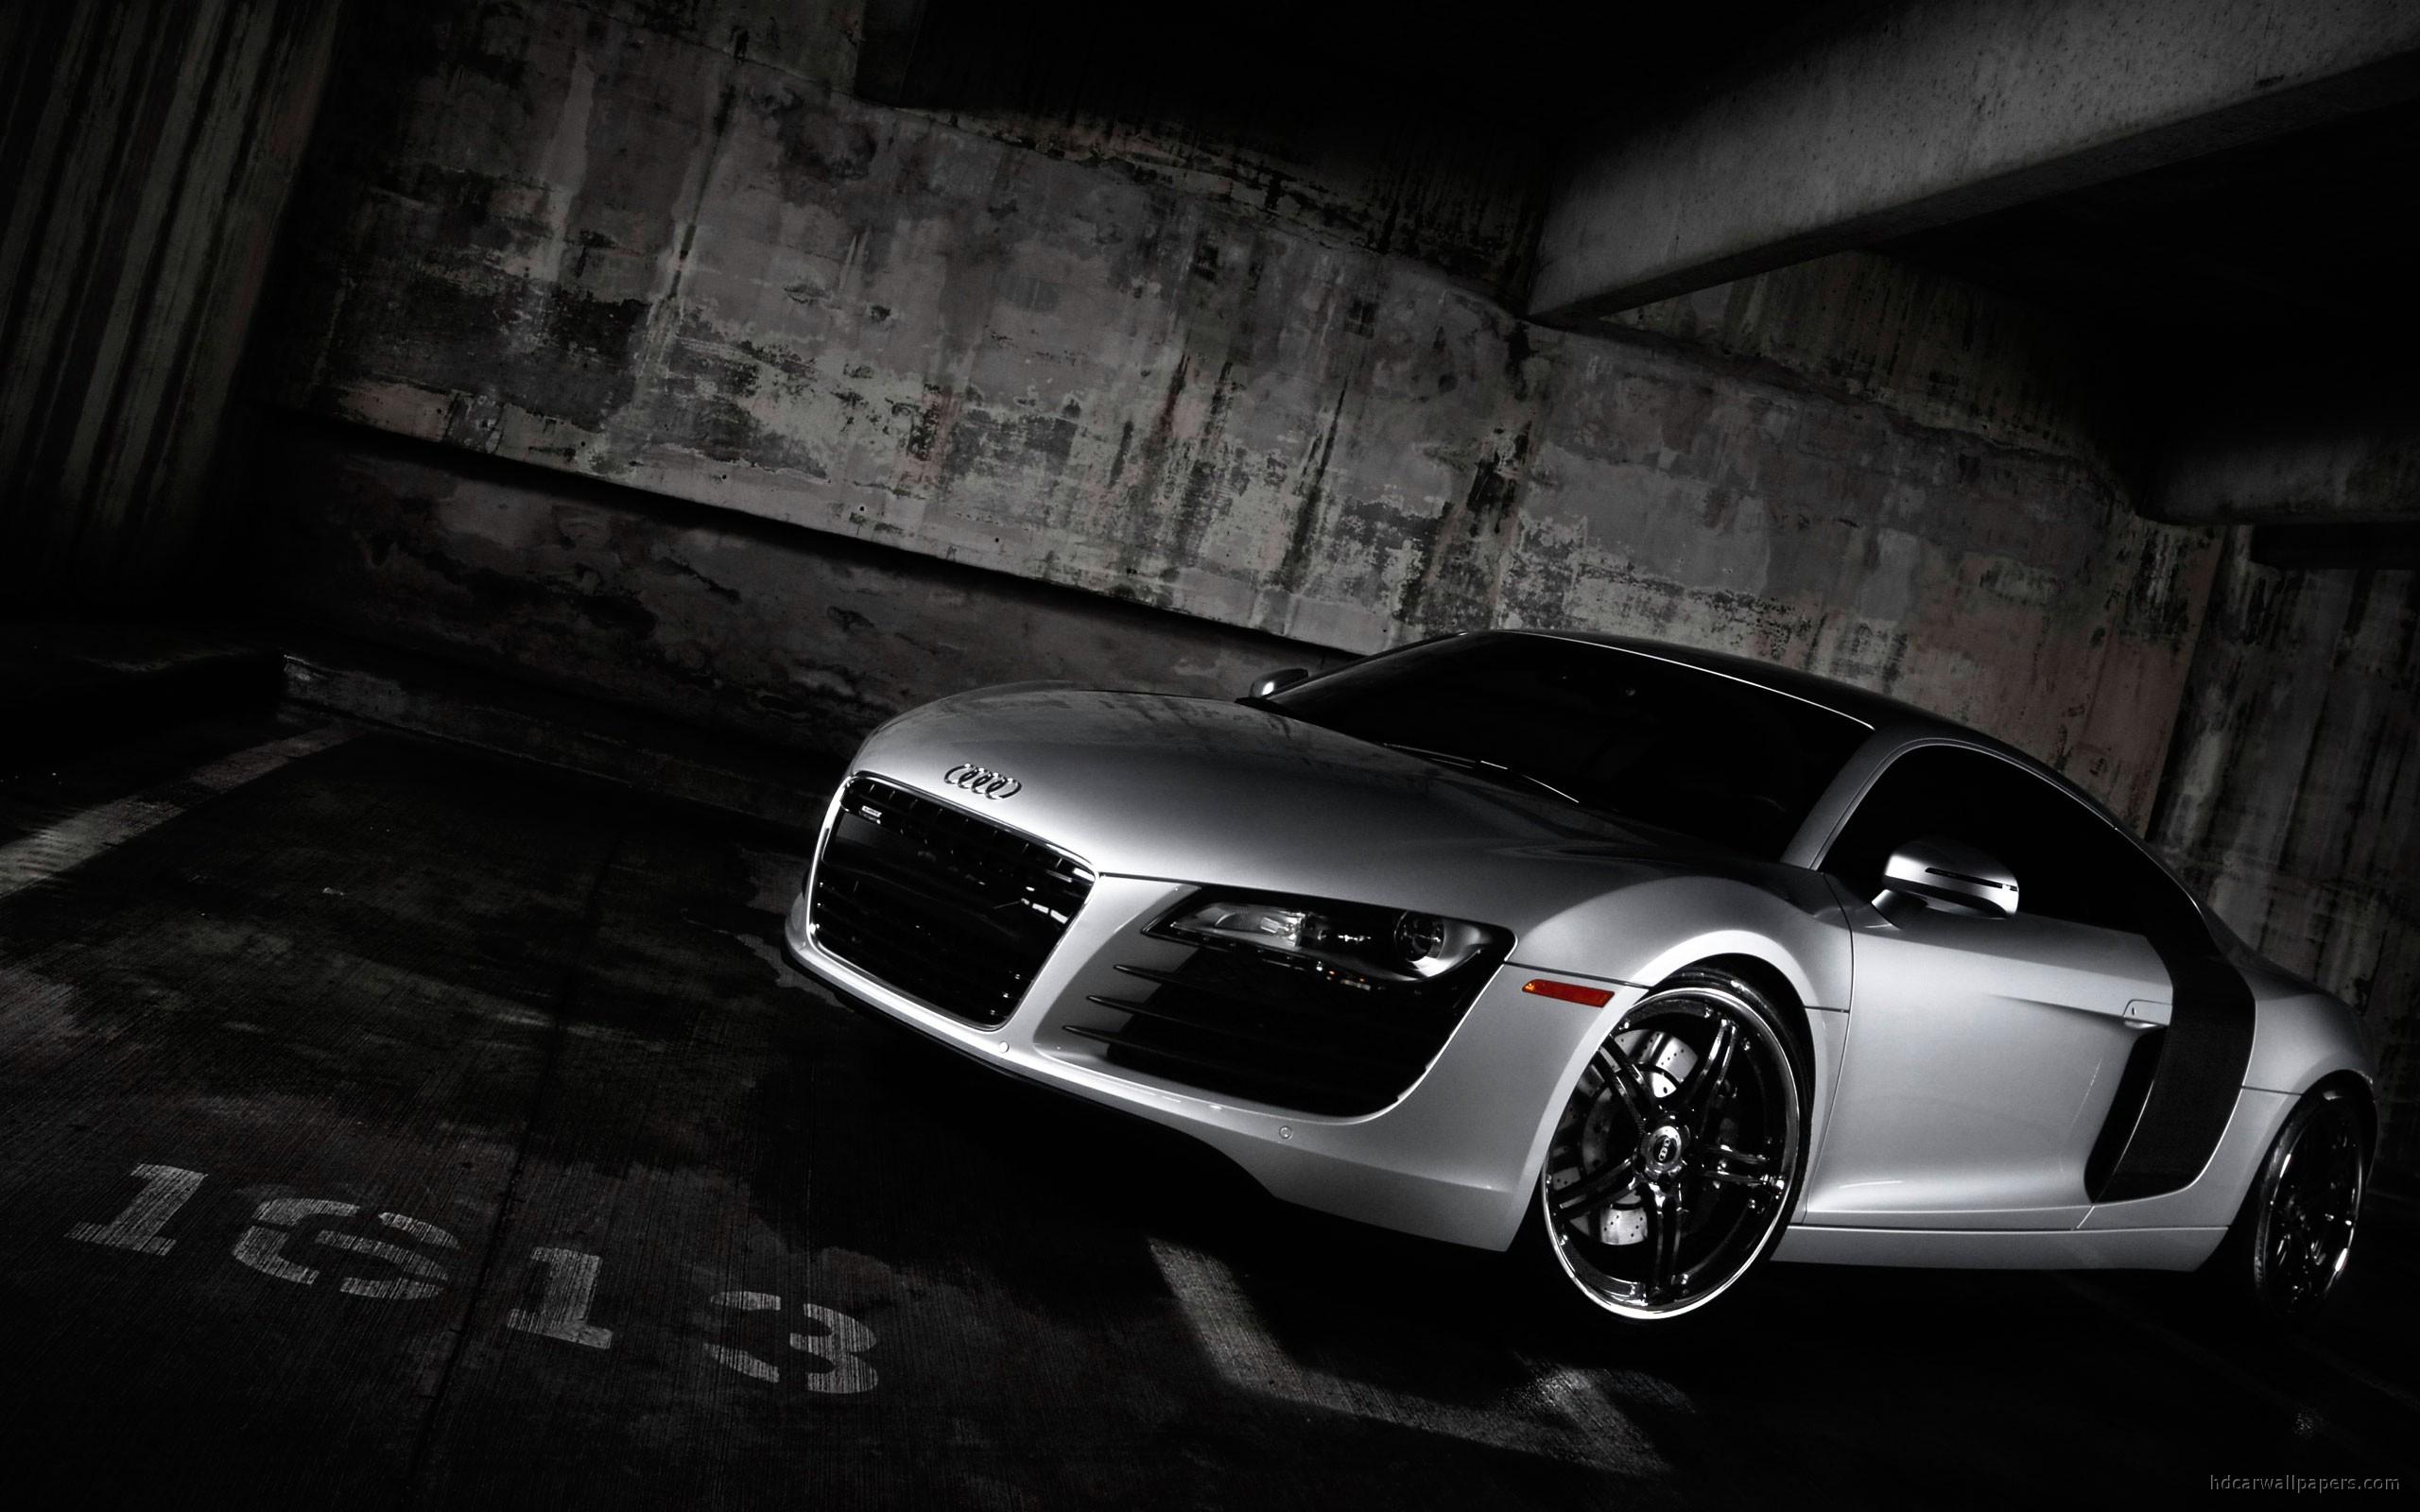 Audi R8 HD Widescreen Wallpaper | HD Car Wallpapers